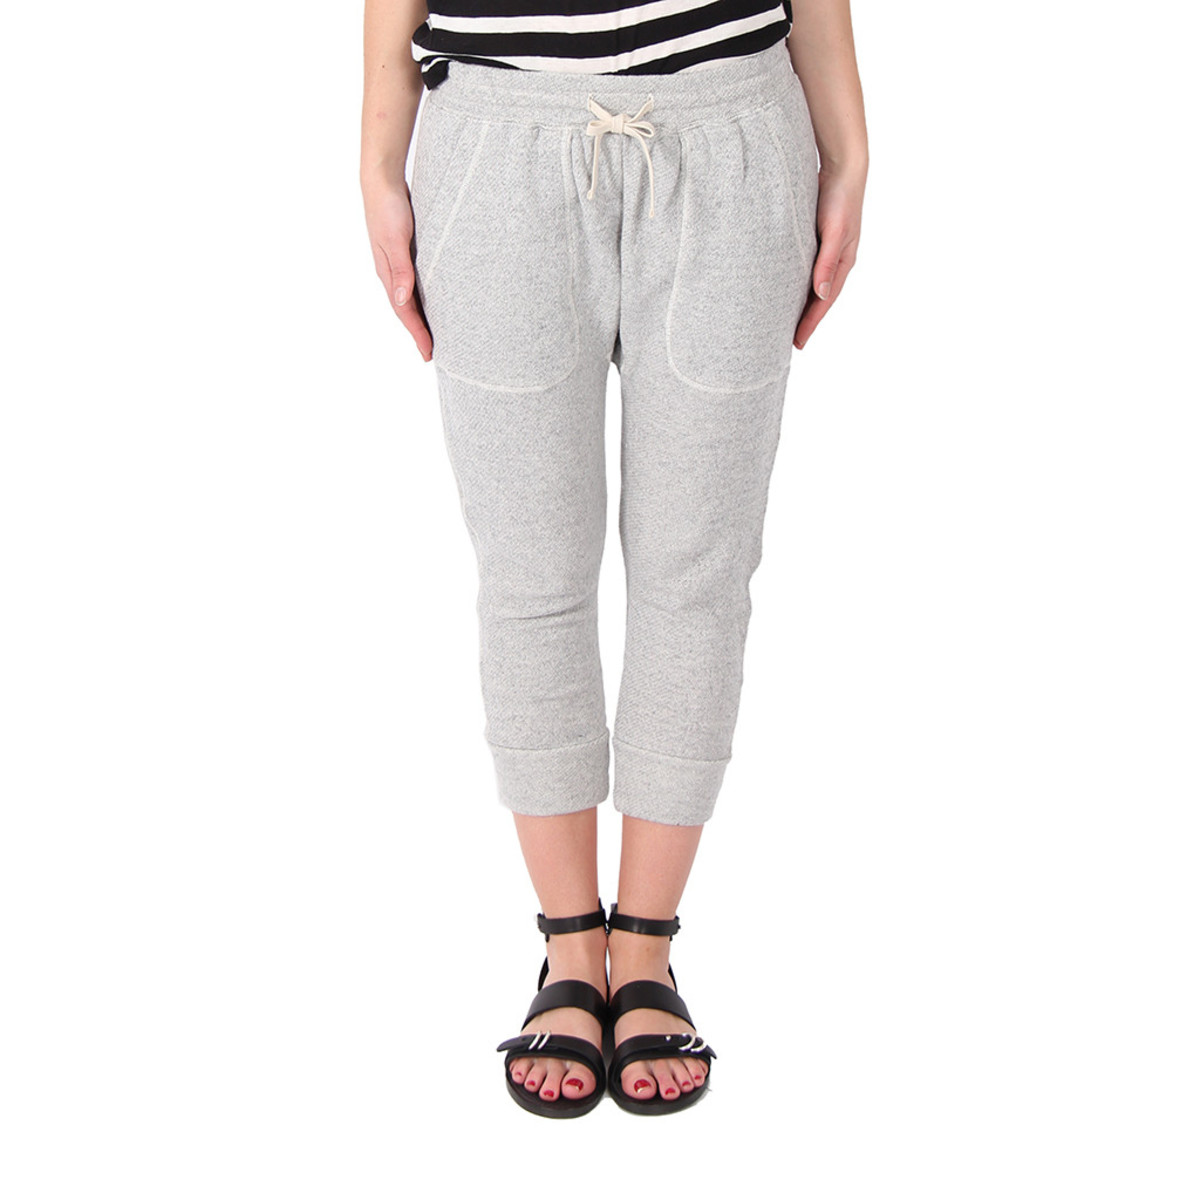 Harem Pants Fashion In Toronto Stores